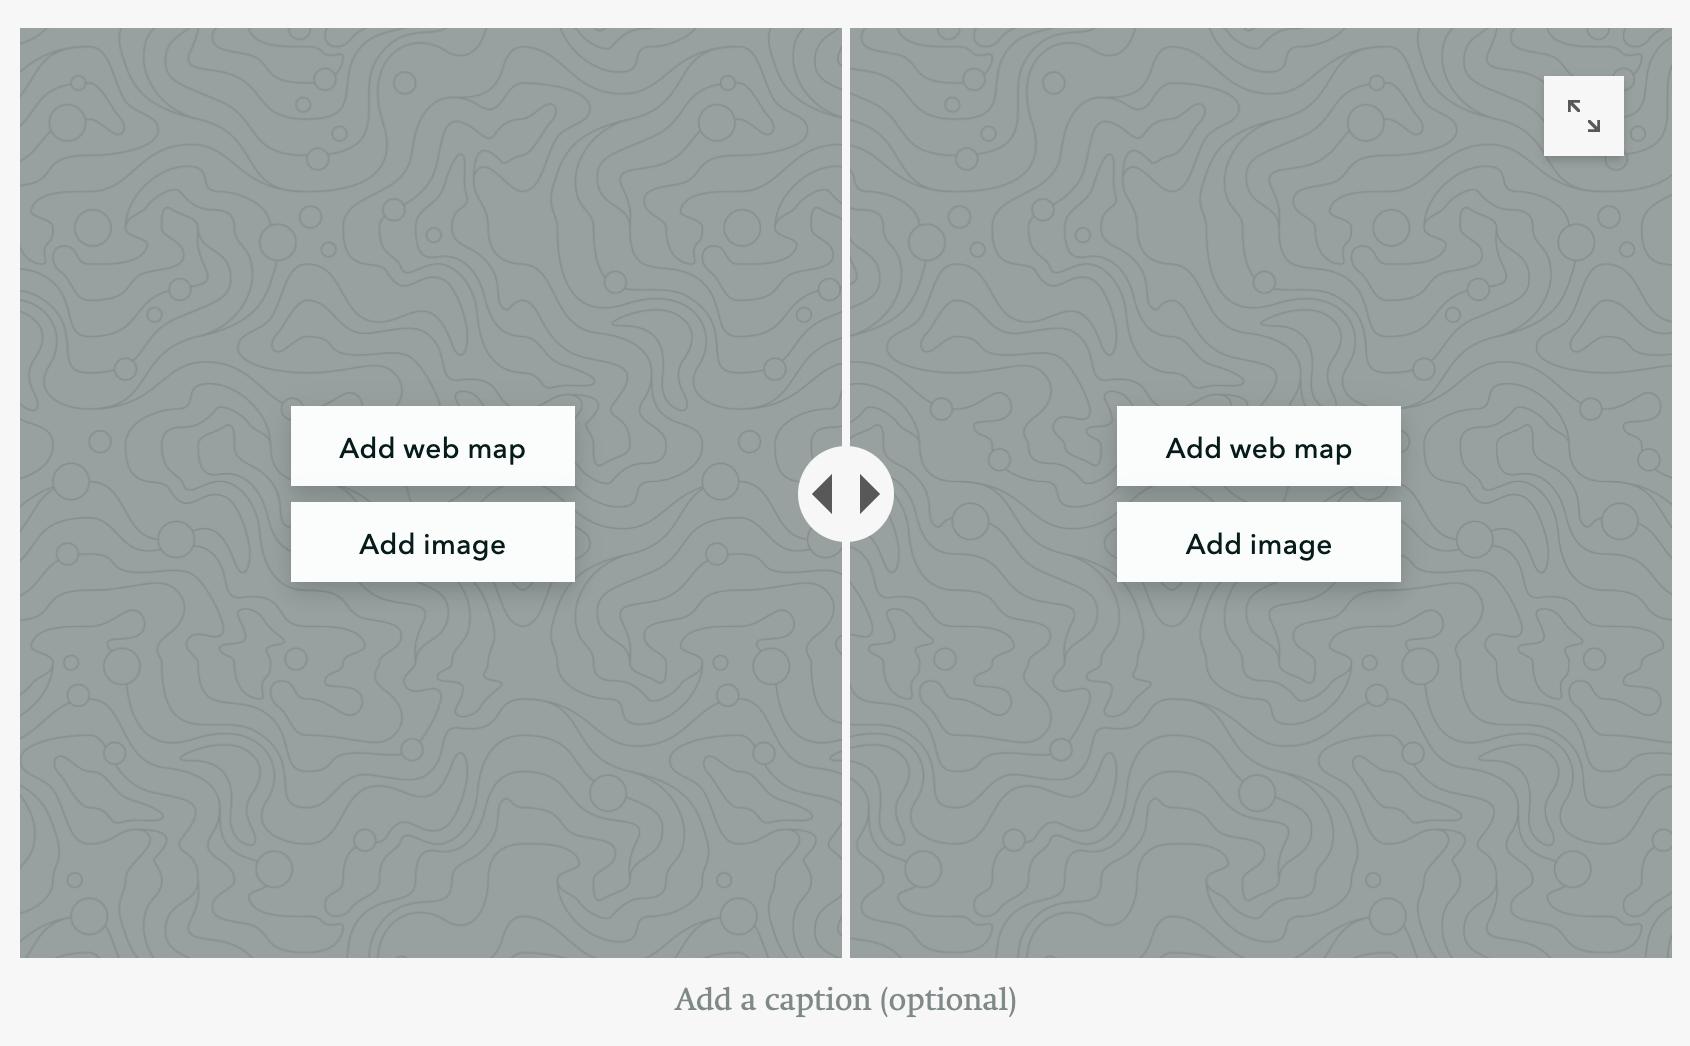 Slider feature in StoryMaps